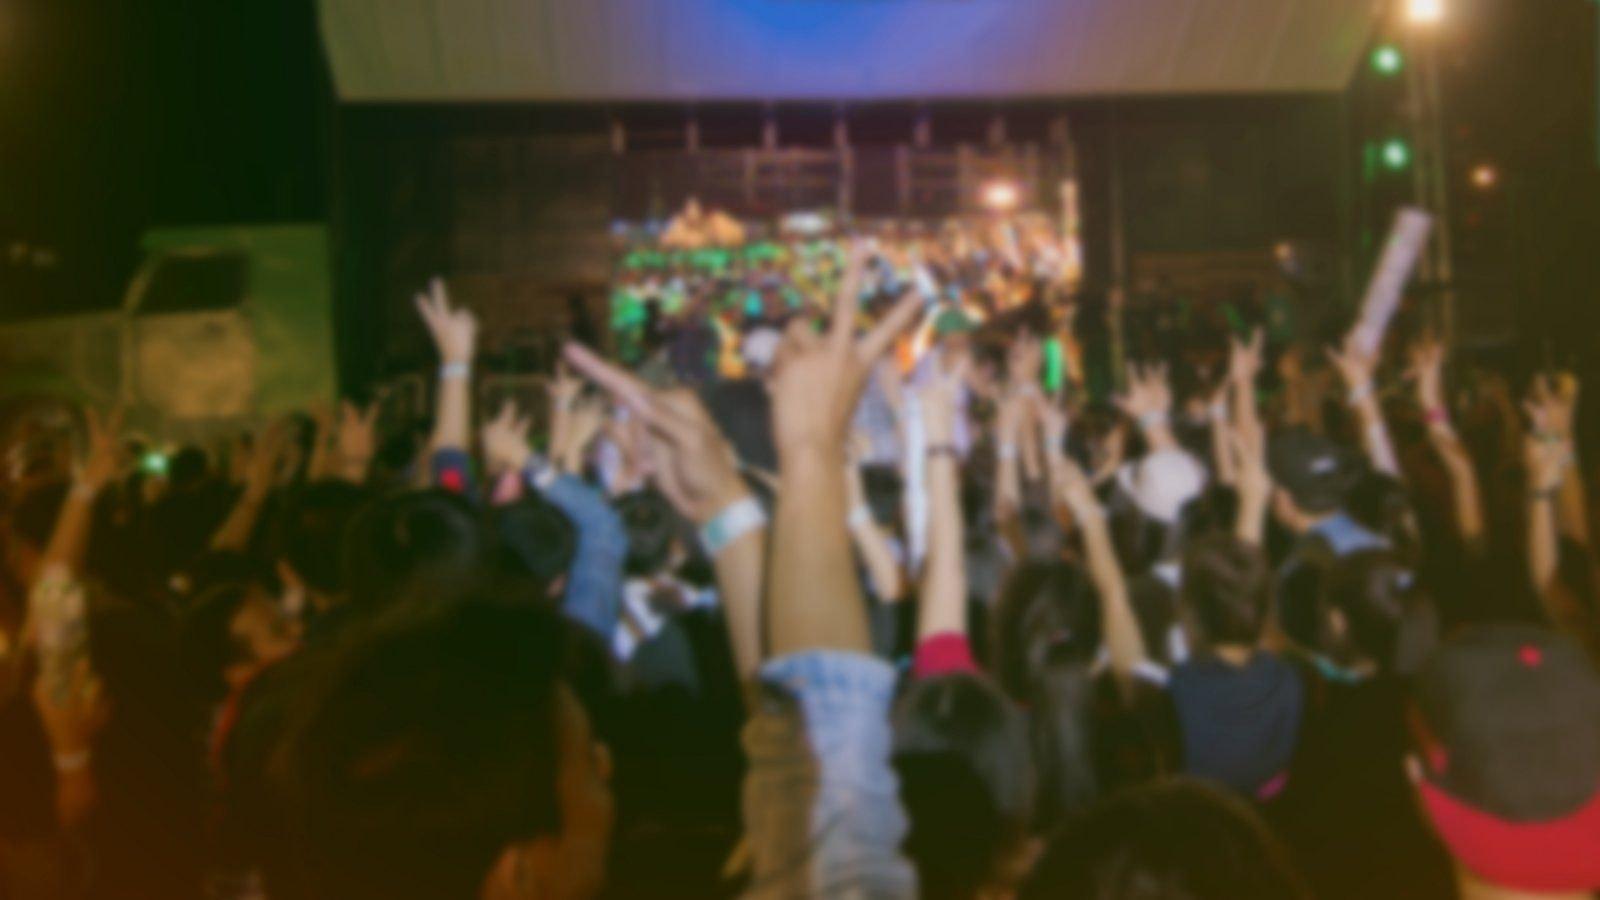 concertje-feest-muziek